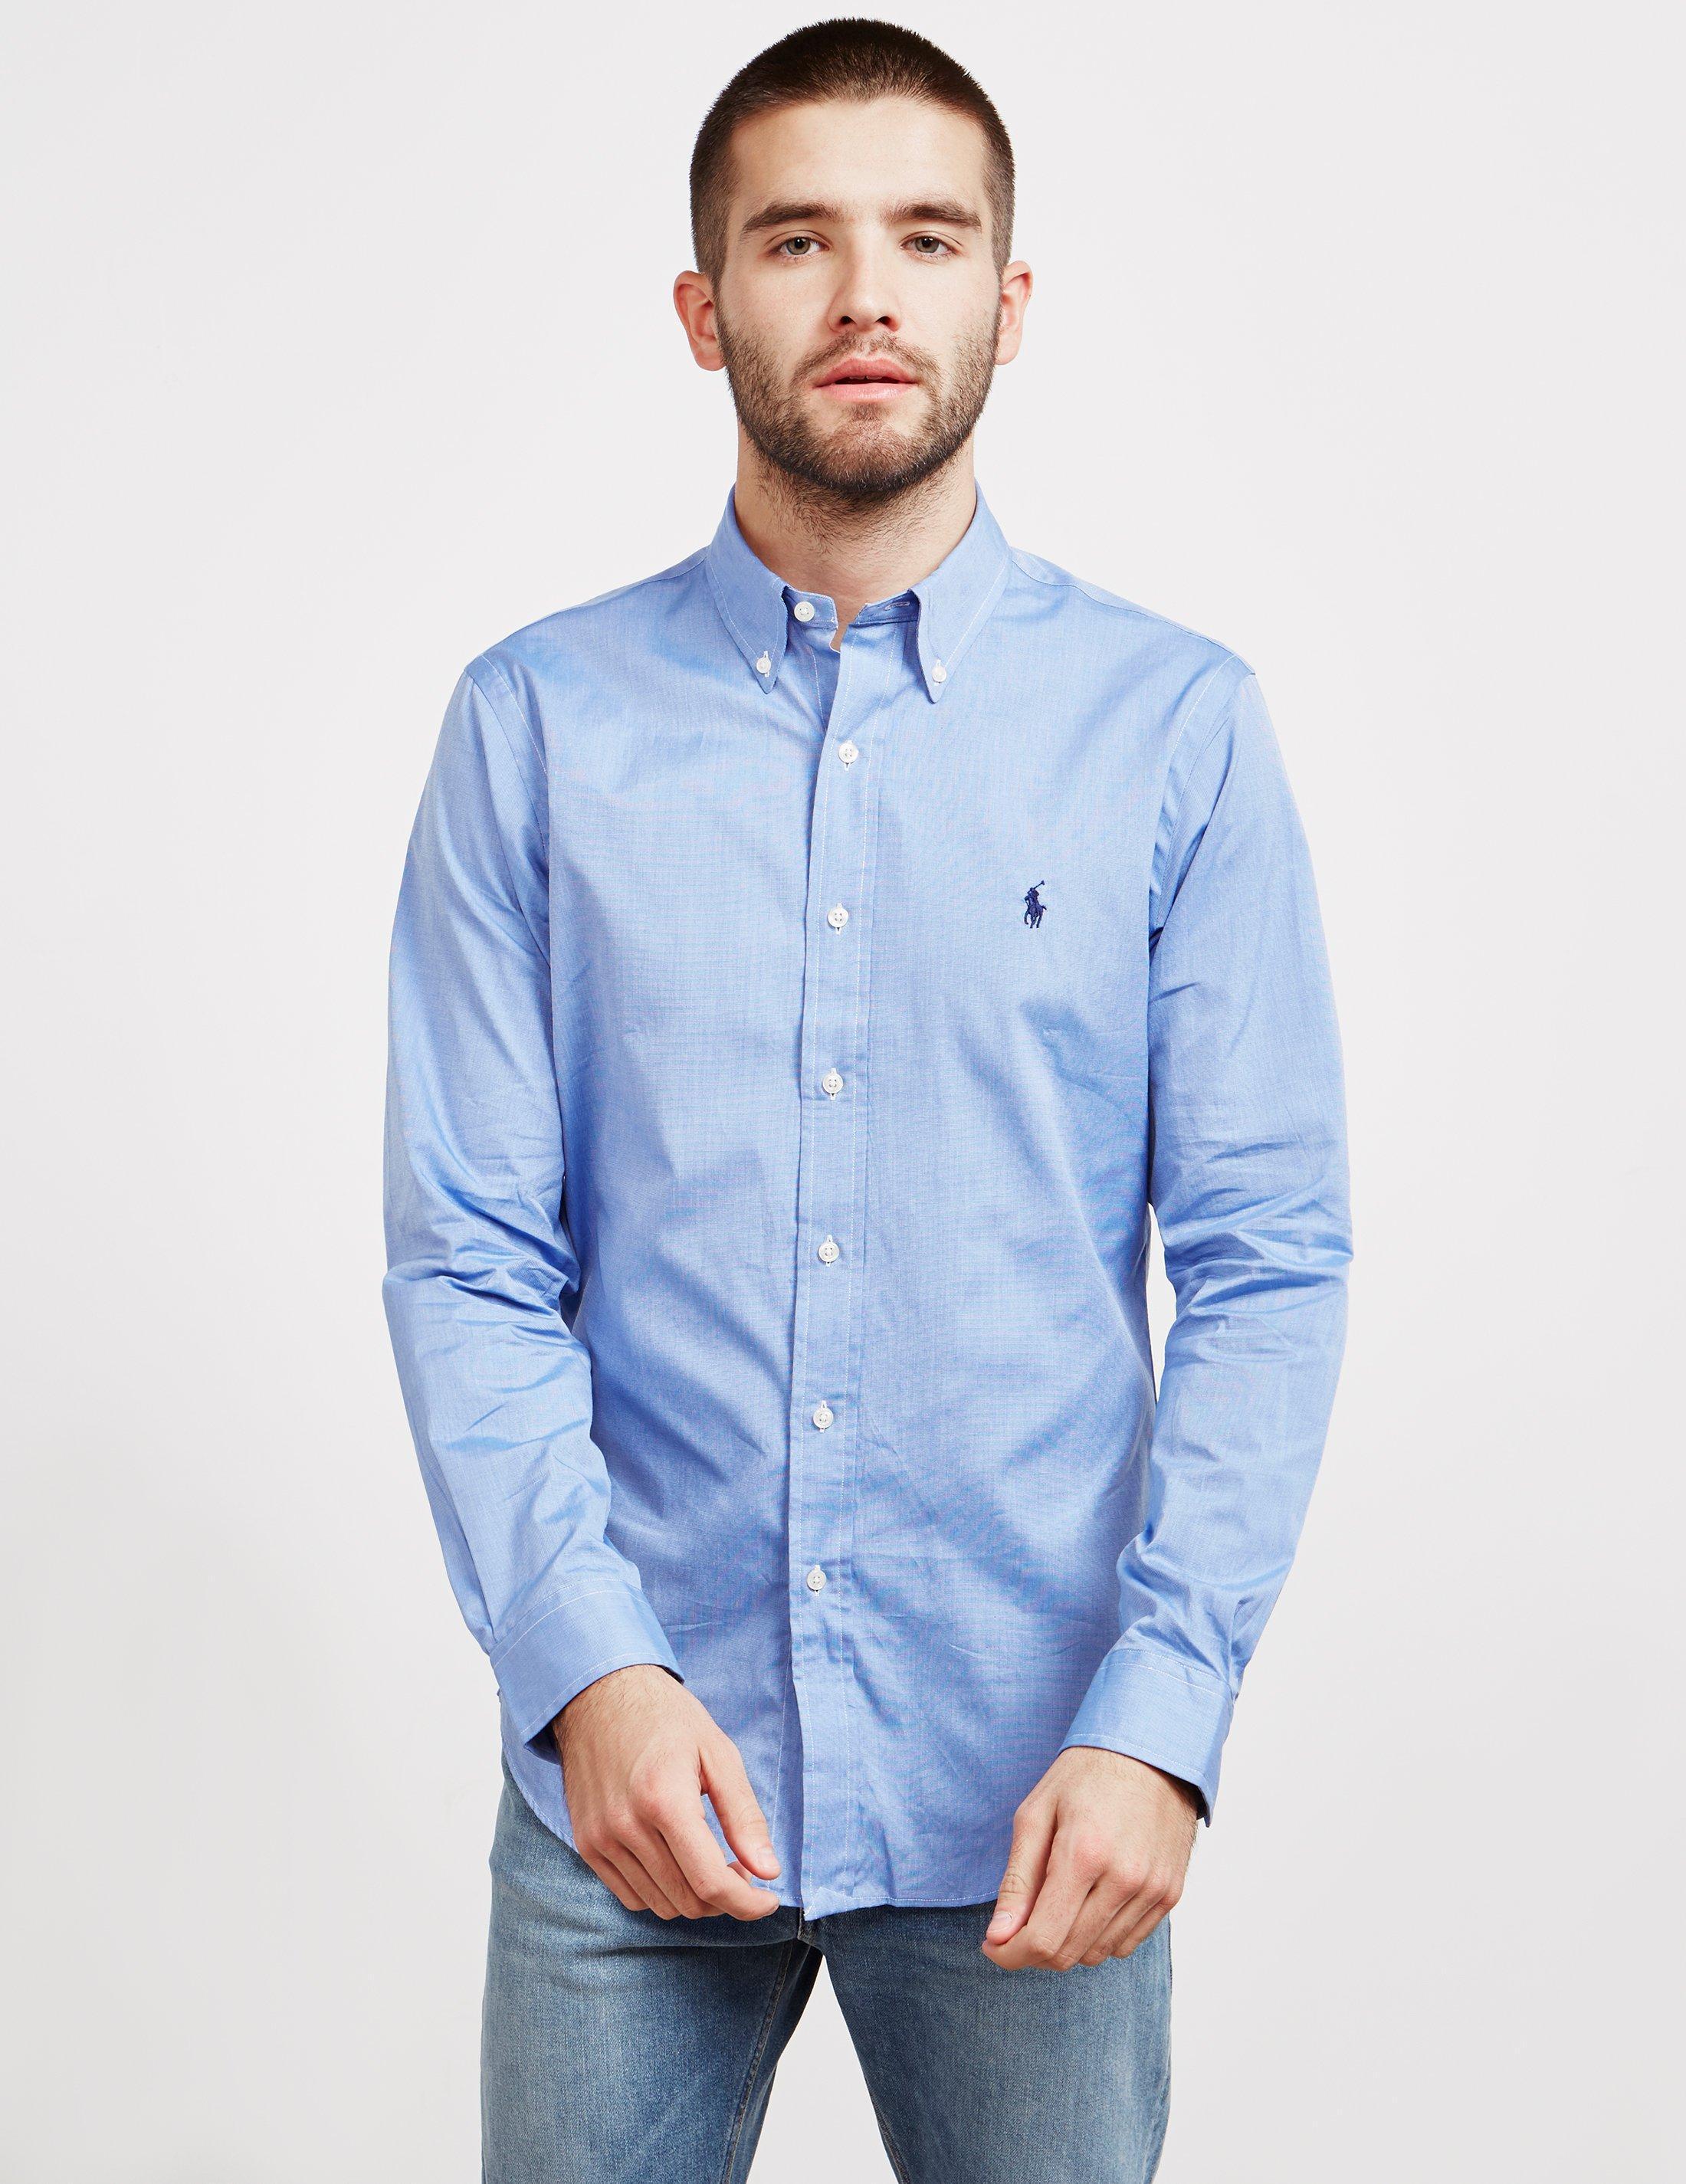 96b09826a0b15 Lyst - Polo Ralph Lauren Mens Poplin Slim Long Sleeve Shirt Blue in ...